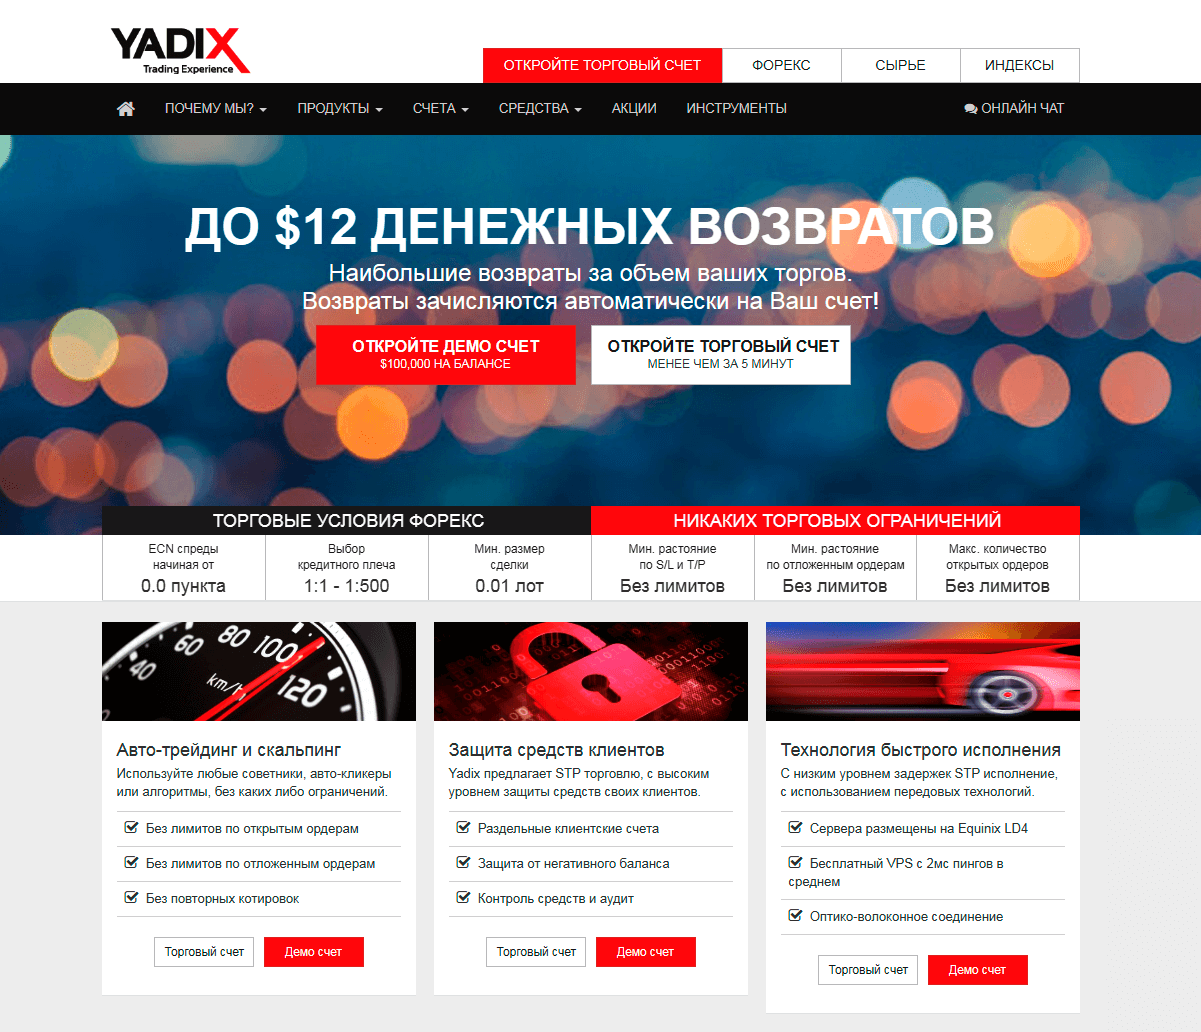 Yadix-1